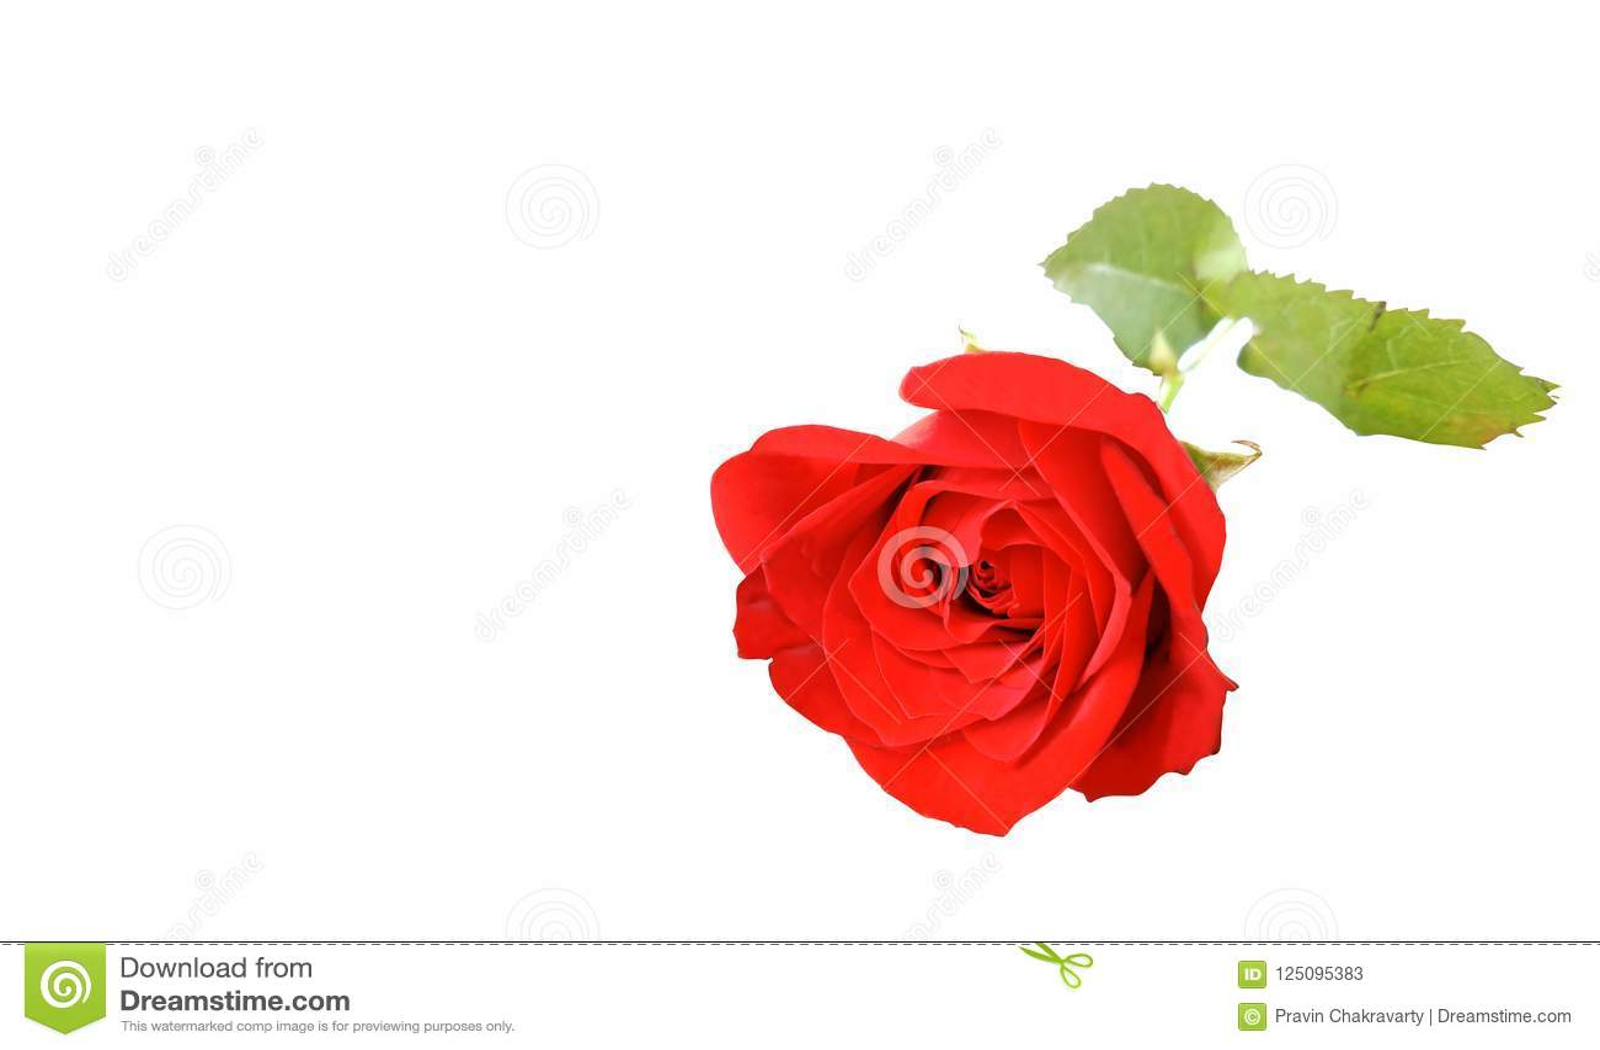 Rose Flower Uses Topsimages